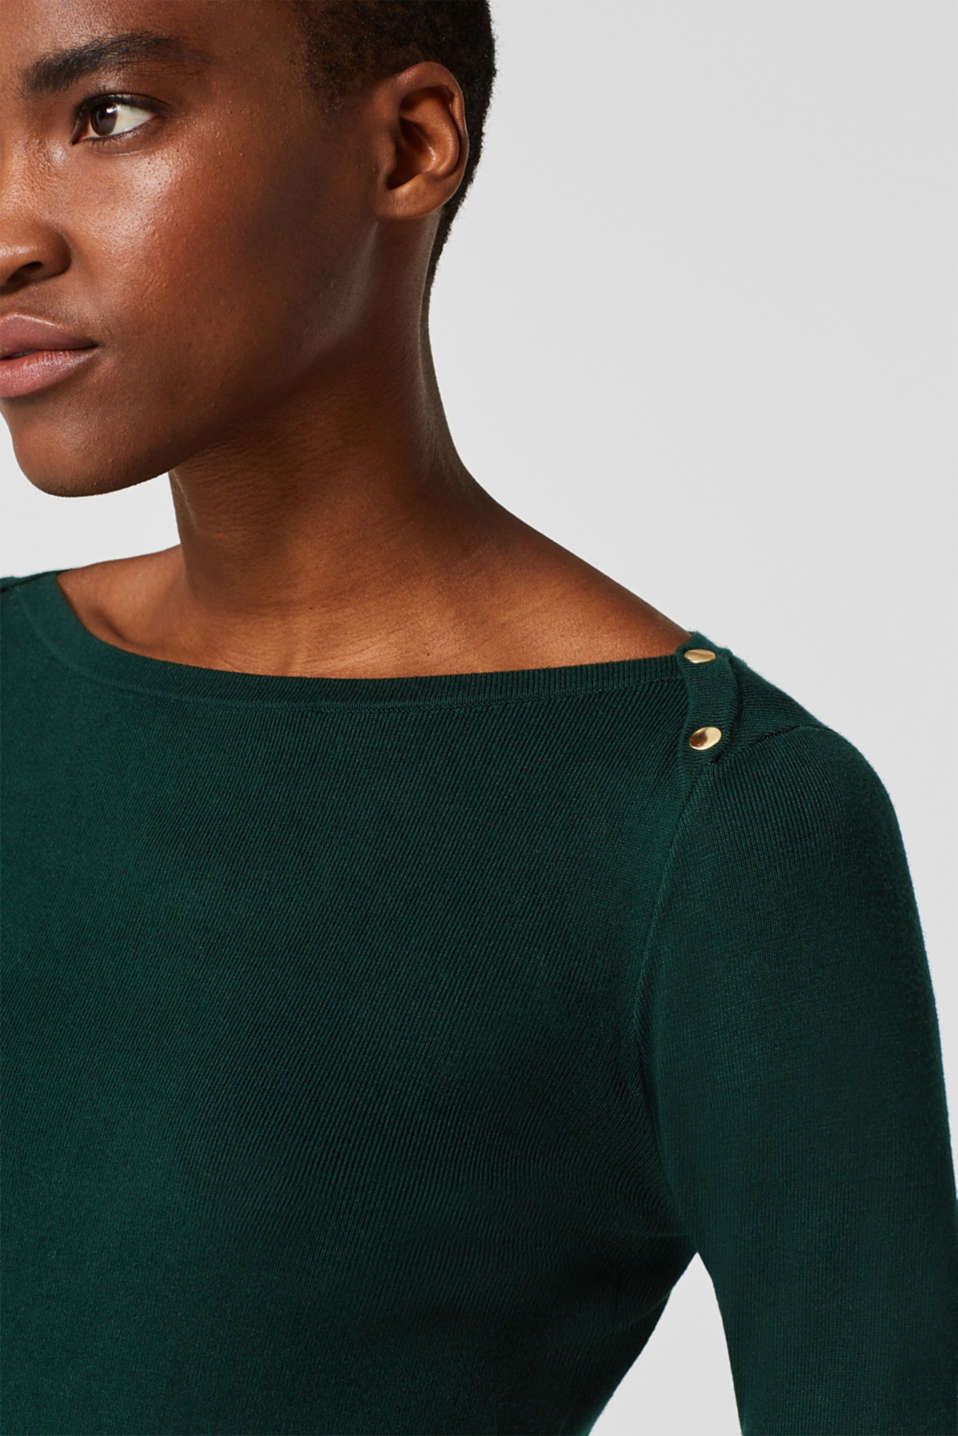 Fine-knit sheath dress, BOTTLE GREEN, detail image number 3